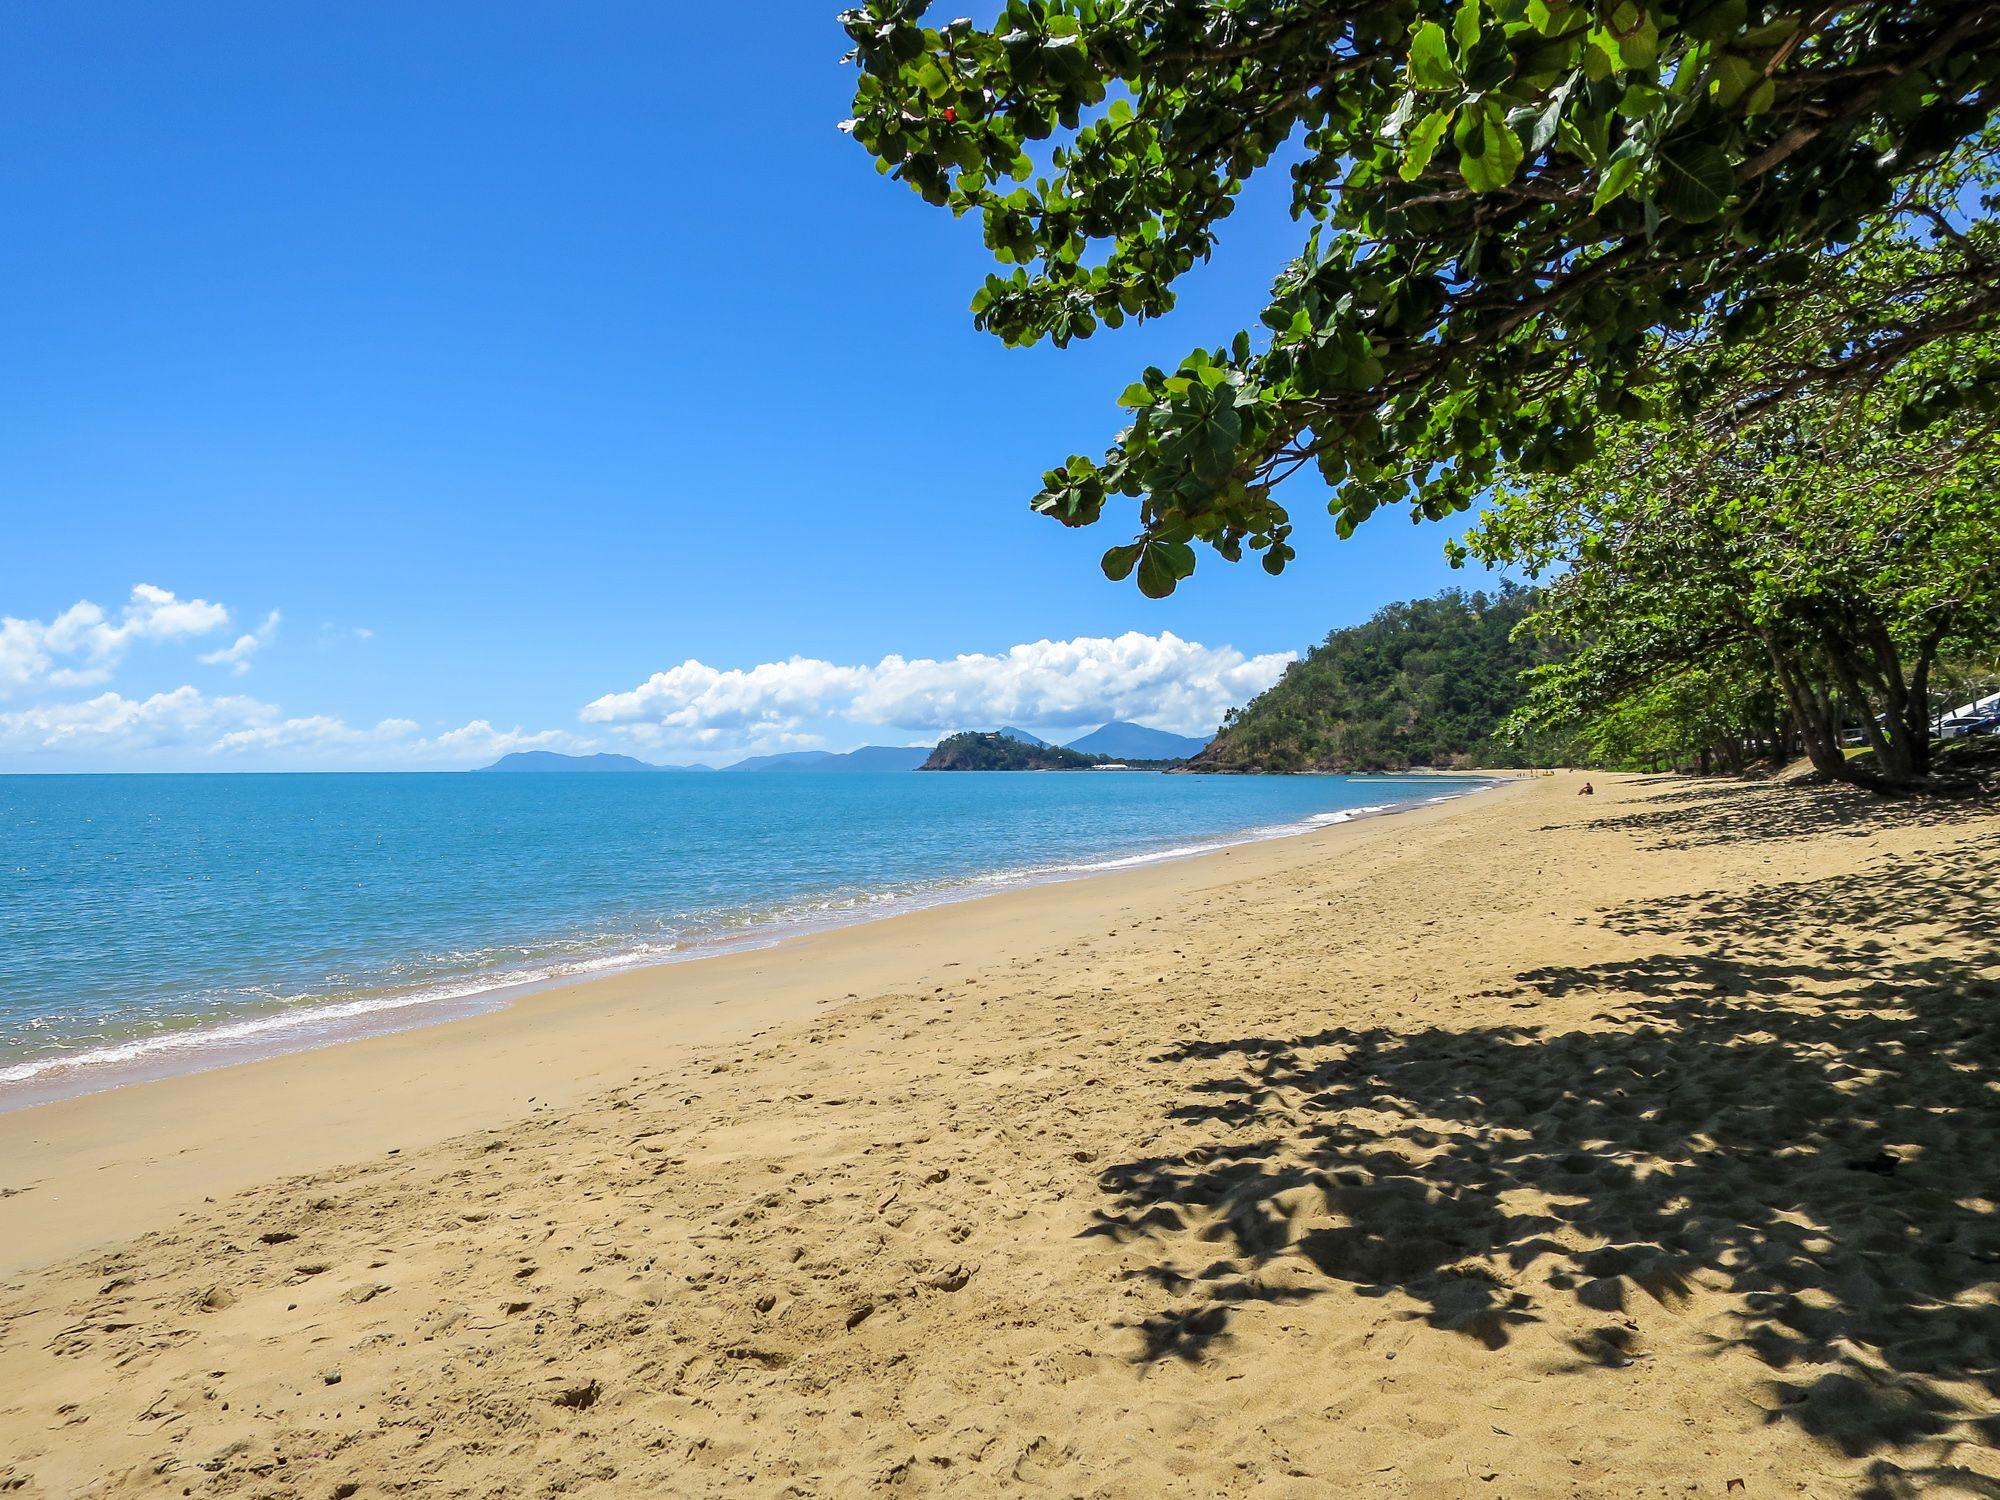 Perfect beach day | Beach, Travel photography, Beach day